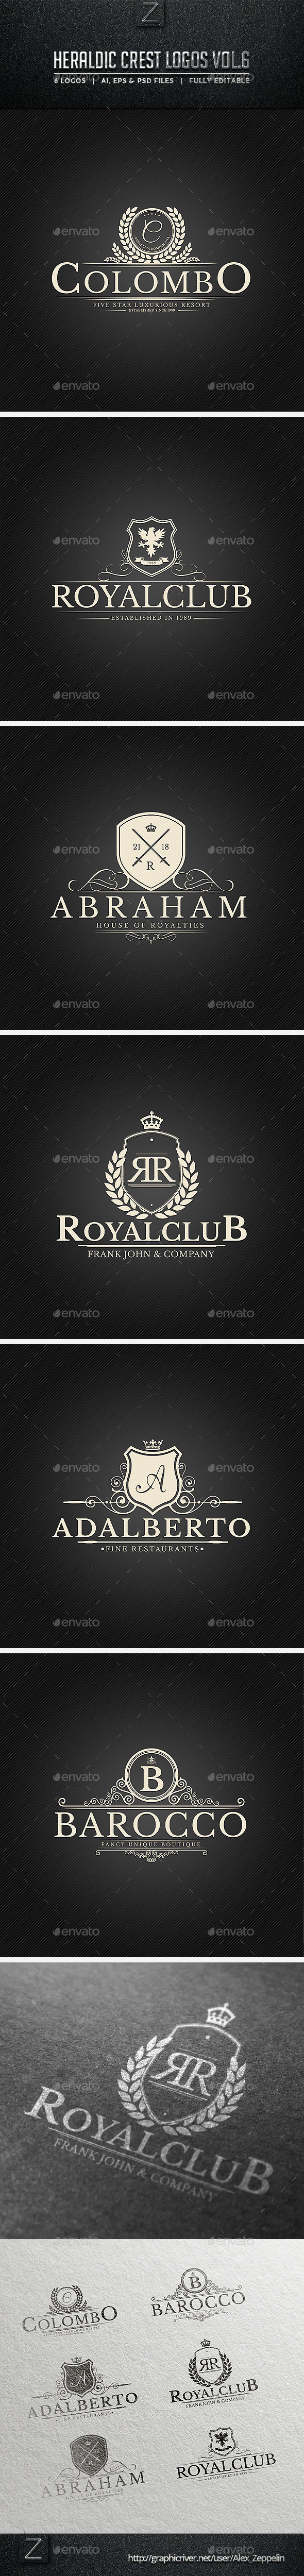 GraphicRiver Heraldic Crest Logos Vol.6 10256199